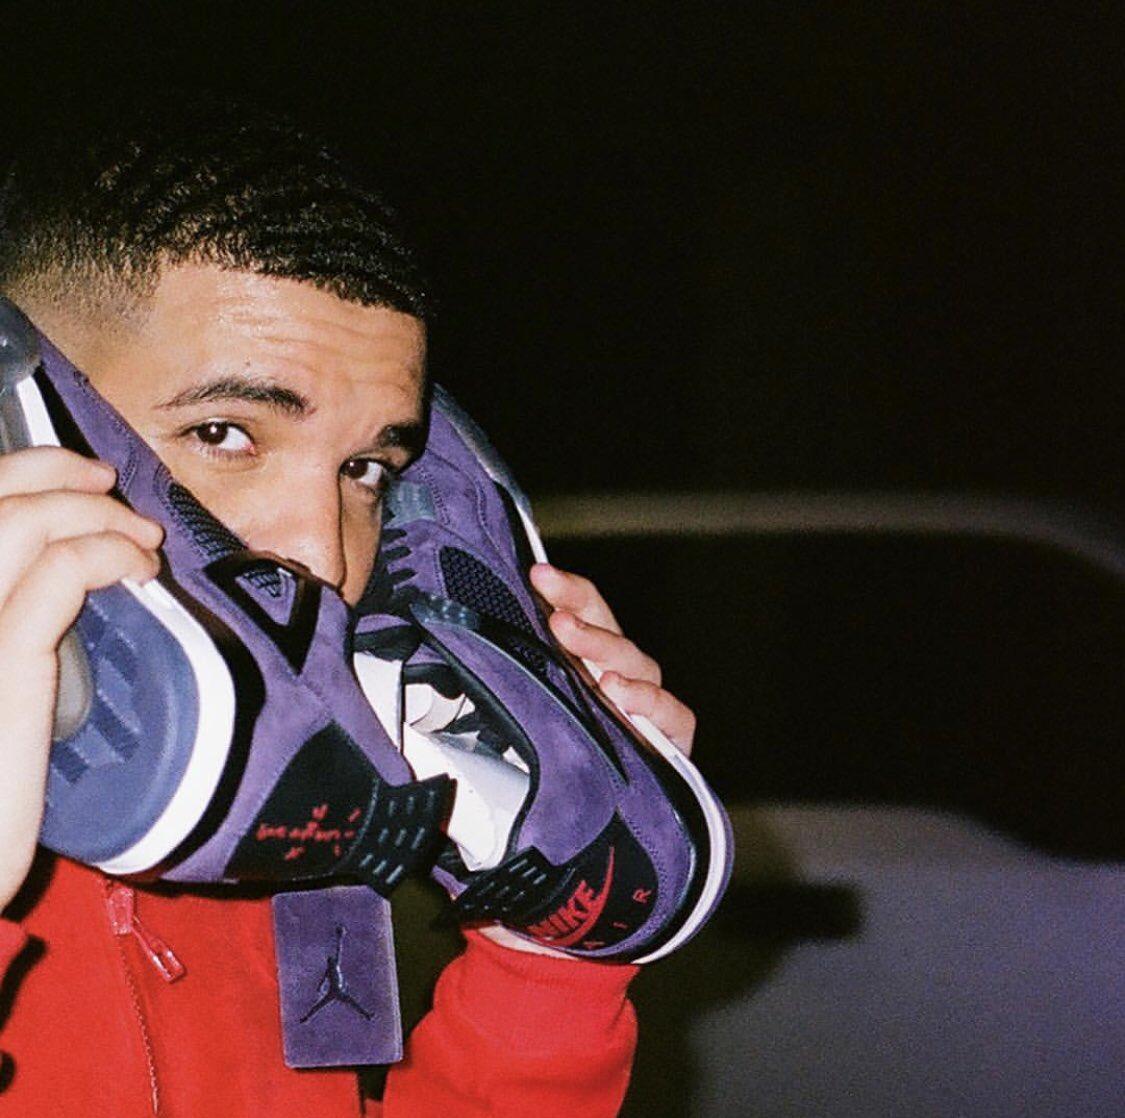 Nike,Yeezy,adidas,Air Jordan  球鞋这么贵都赖他们!反钩 AJ1 只能算是普普通通!